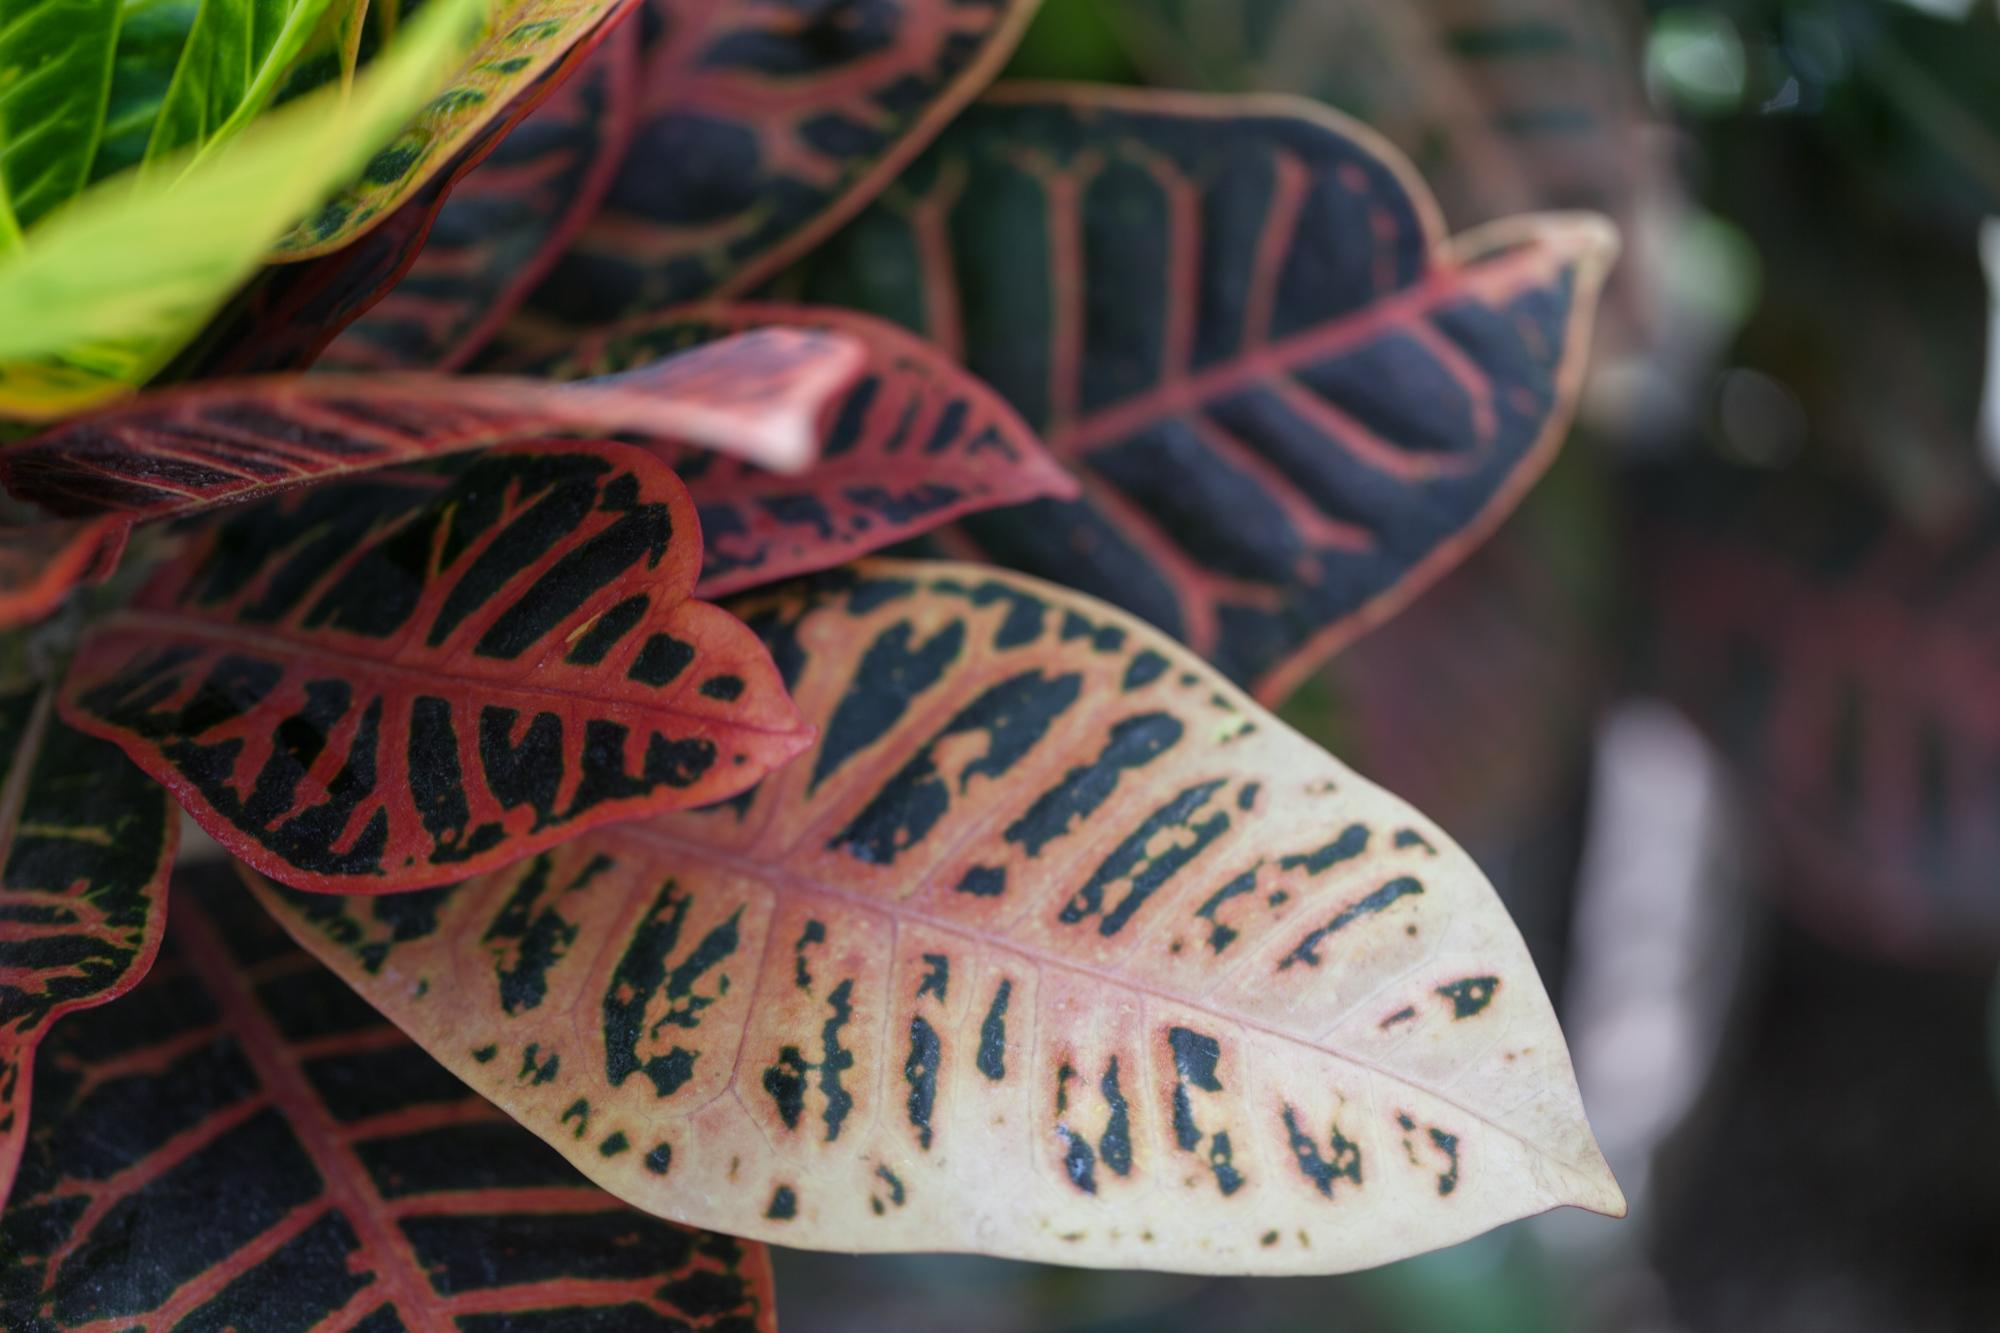 The faded colors of a  Croton. Allan Garden Conservatory, Toronto.